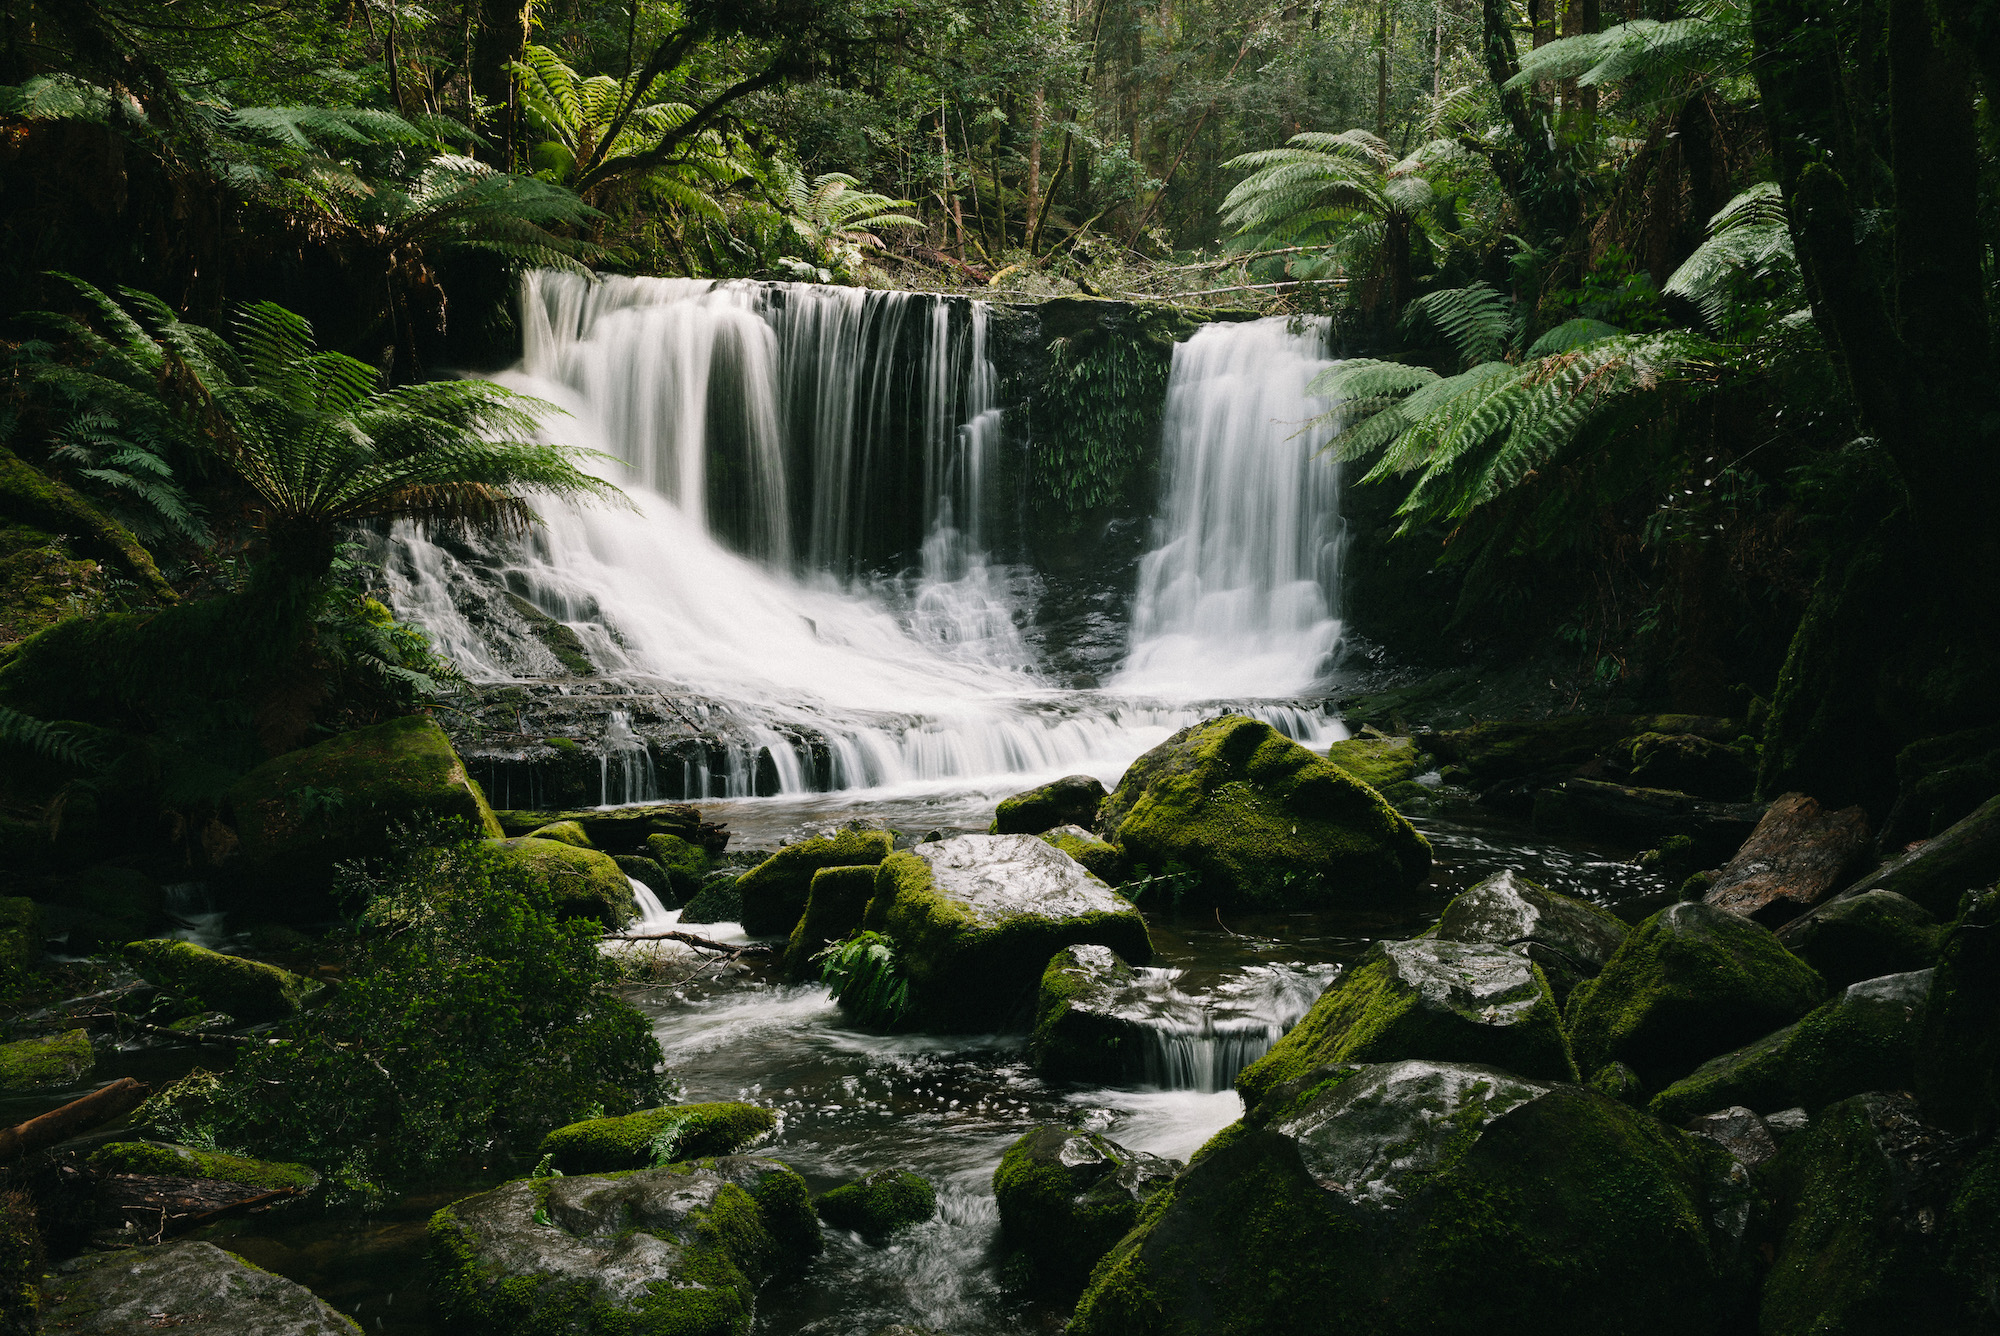 Horseshoe Falls, Tasmania shot on Leica M Typ 240 with Leica Summarit 35mm lens.